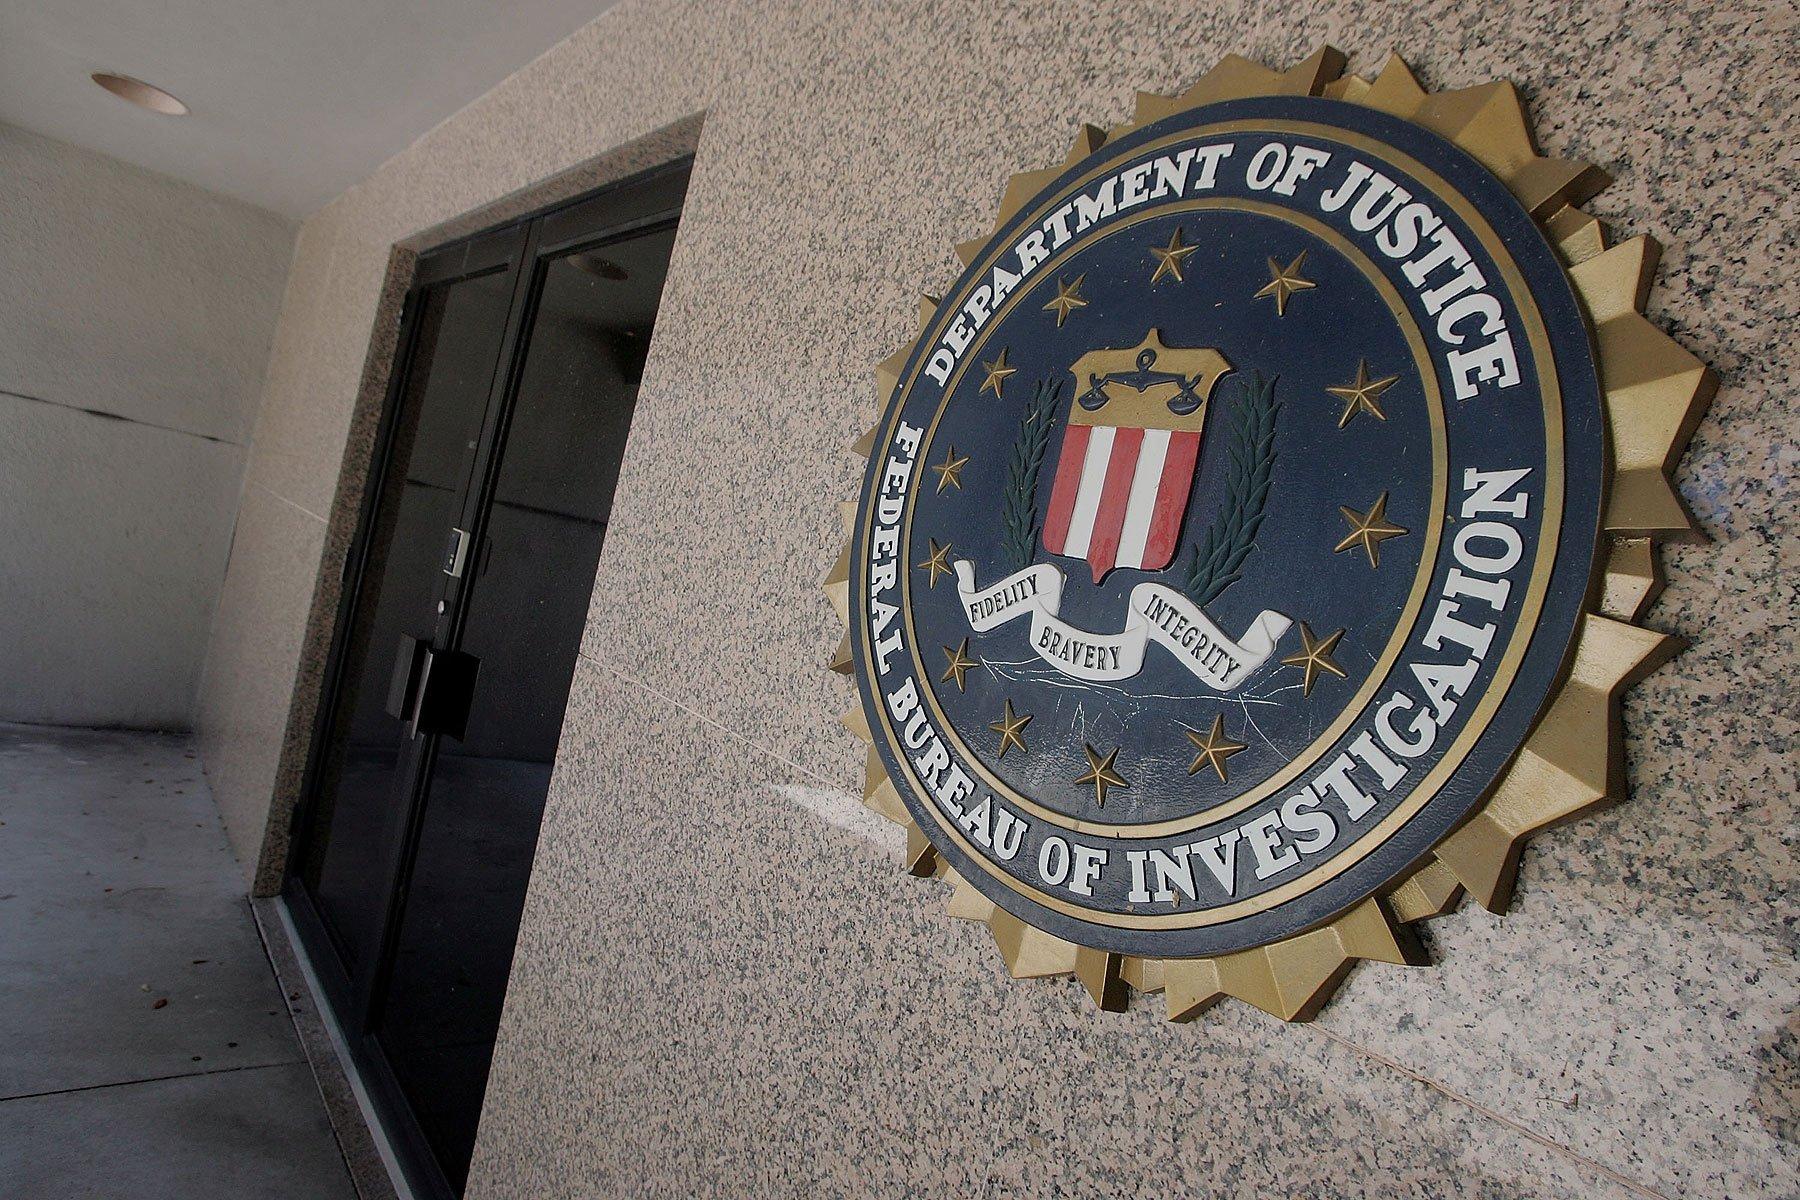 It Wasn't Just Trump, Inspector General Finds FBI Routinely Violates Procedures In FISA Warrant Applications – True Pundit